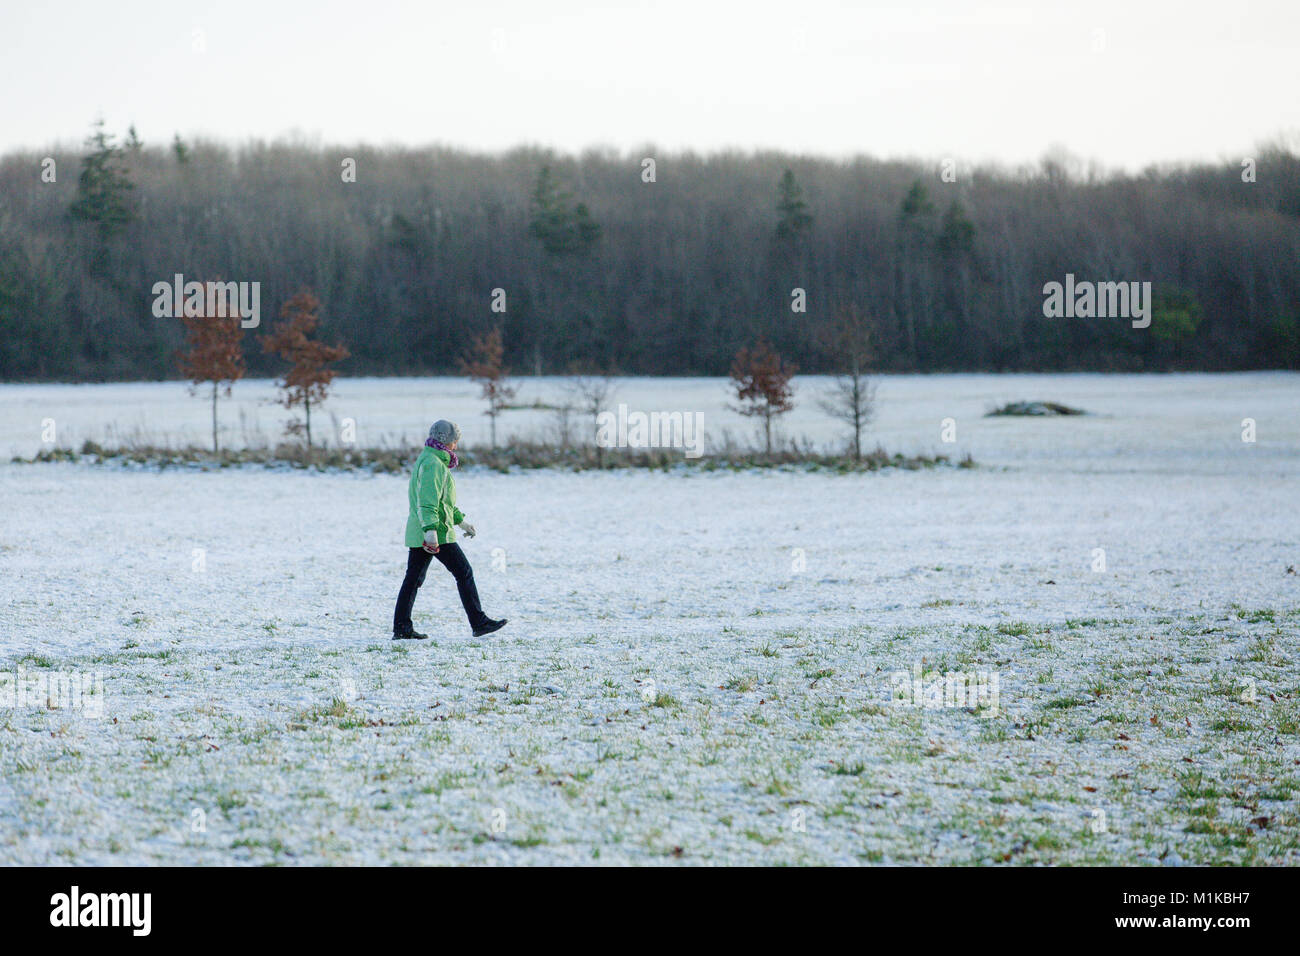 Woman enjoying a morning walk through covered in snow Castletown fields, Celbridge, County Kildare, Ireland - Stock Image